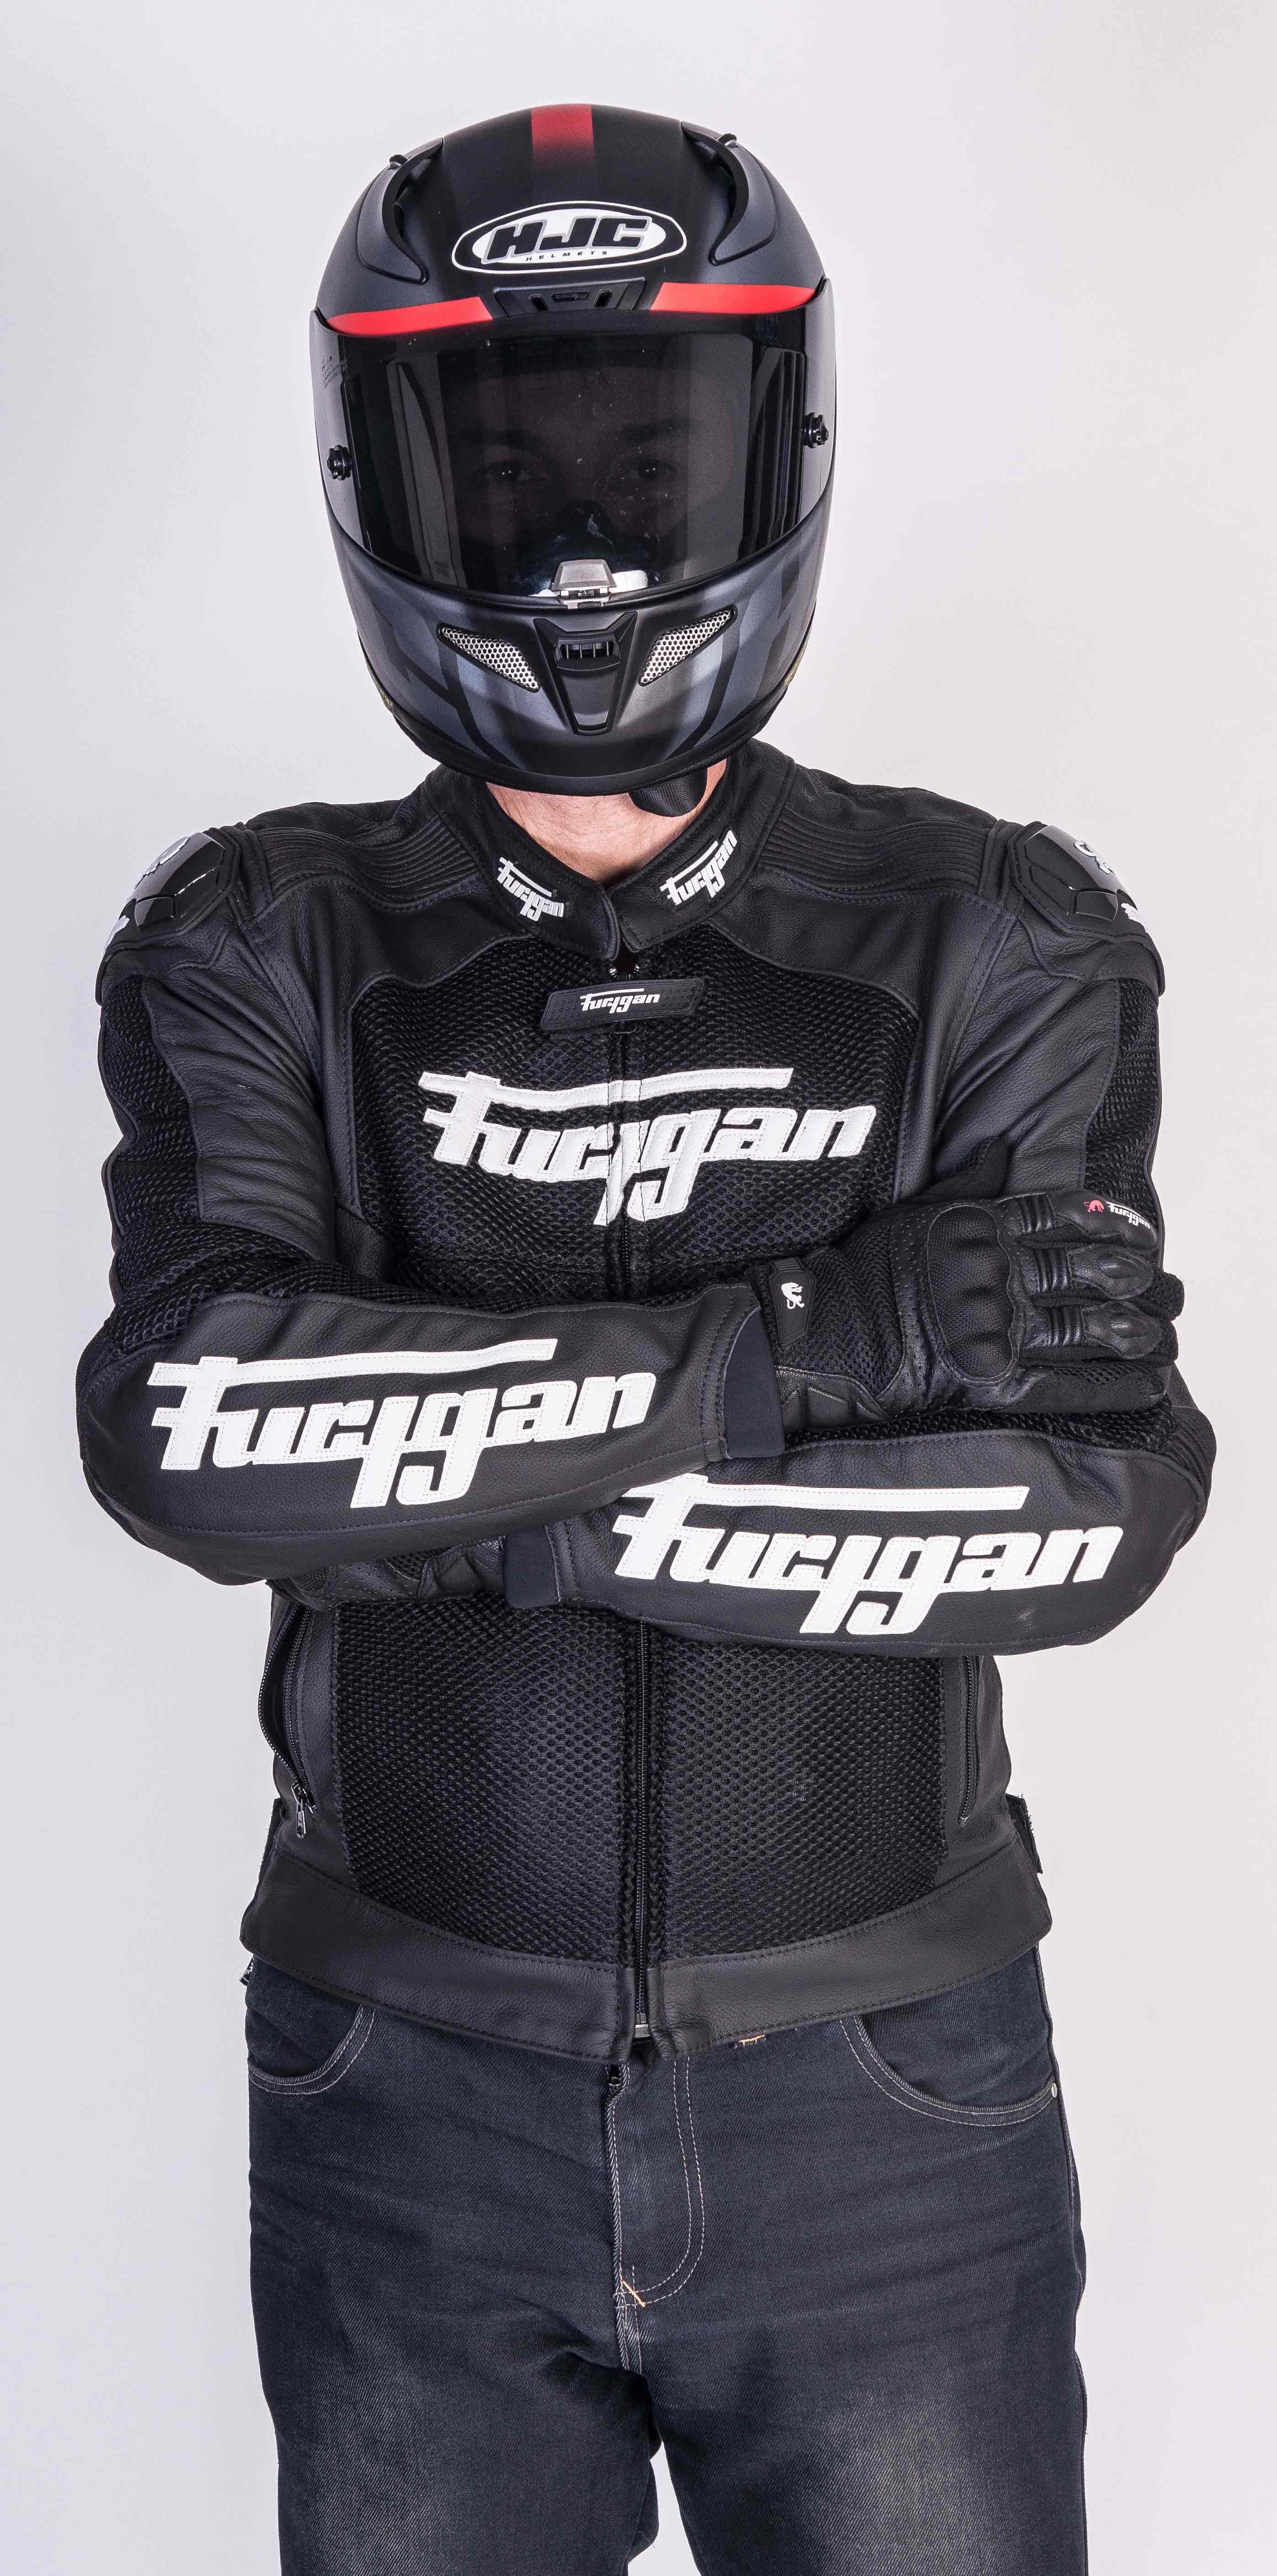 WARR144__Furygan-Testing-1-JCC6124